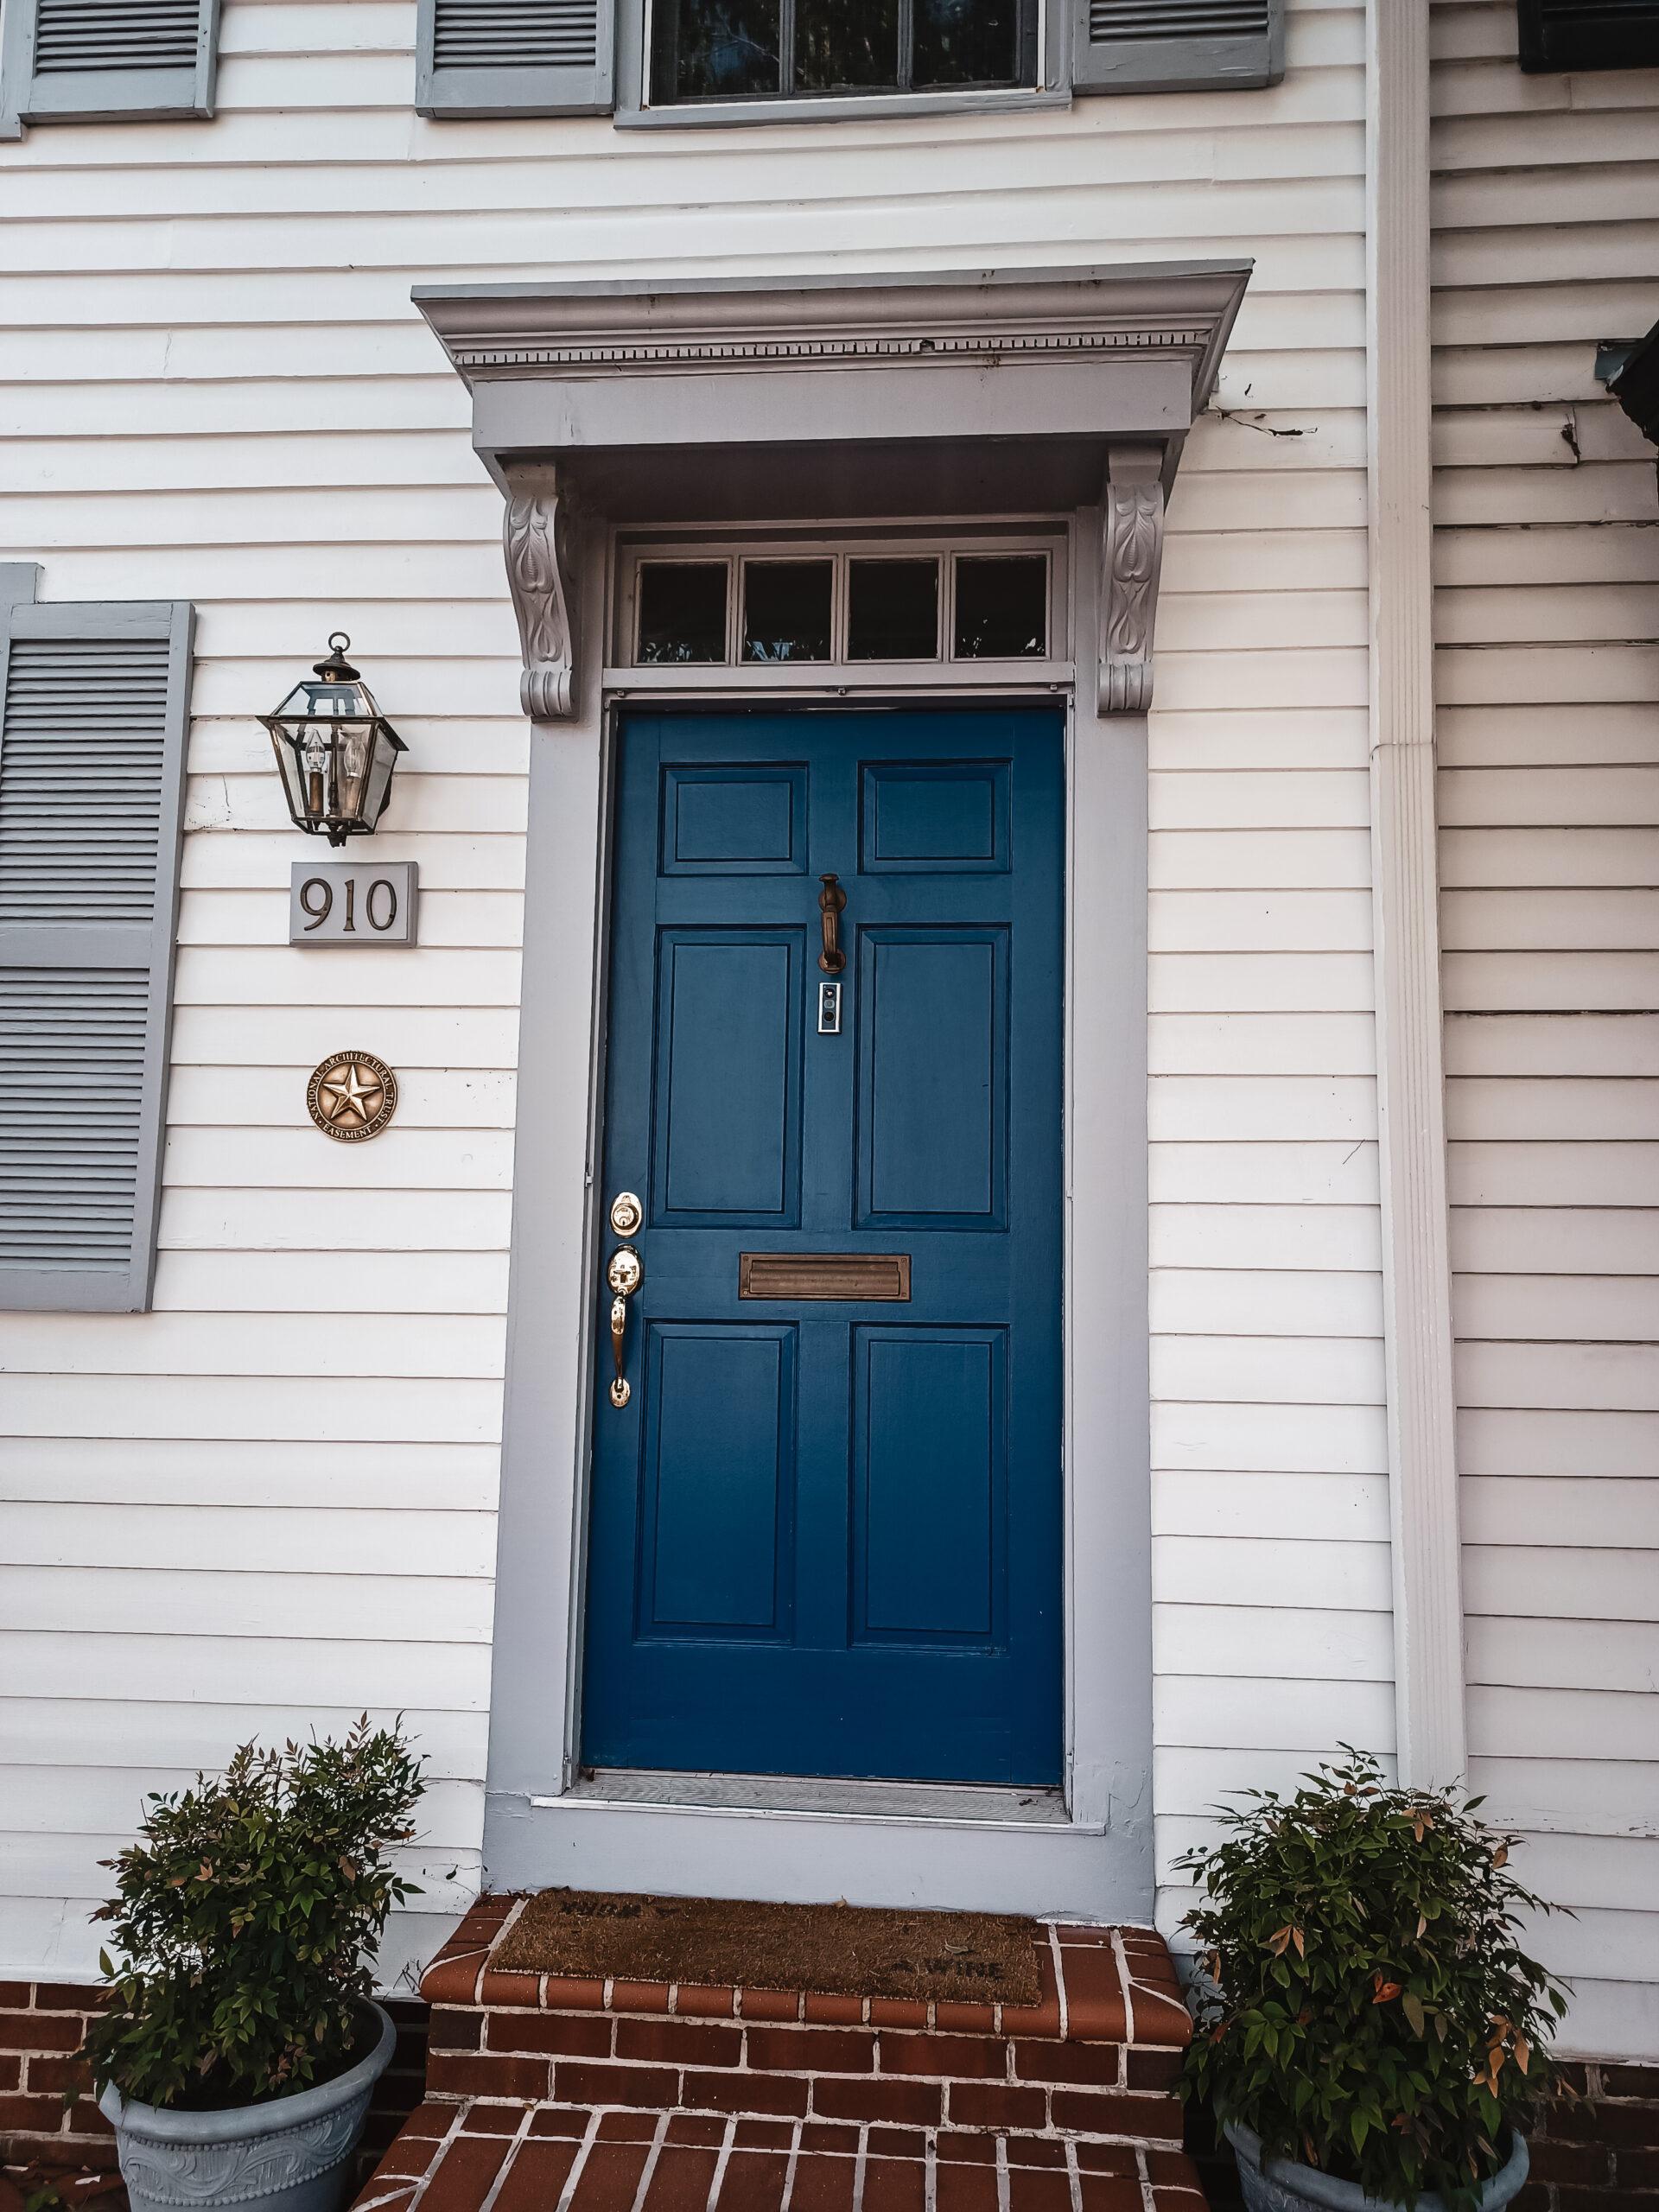 Alexandria Virginia home with blue door This Bahamian Gyal blog